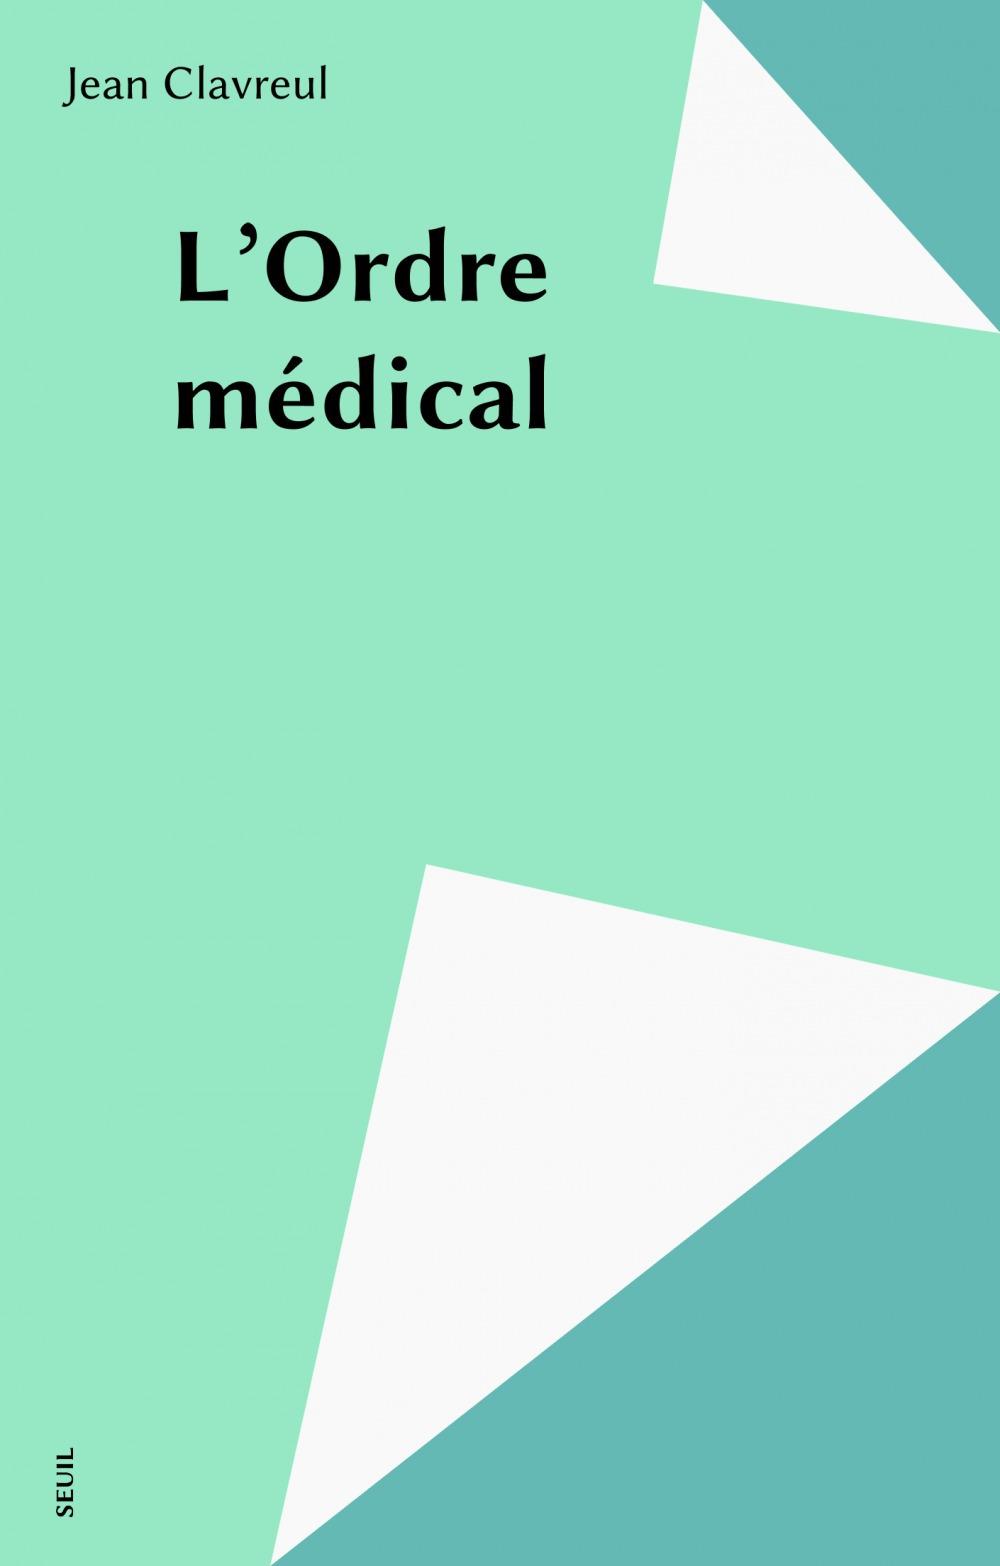 Jean Clavreul L'Ordre médical